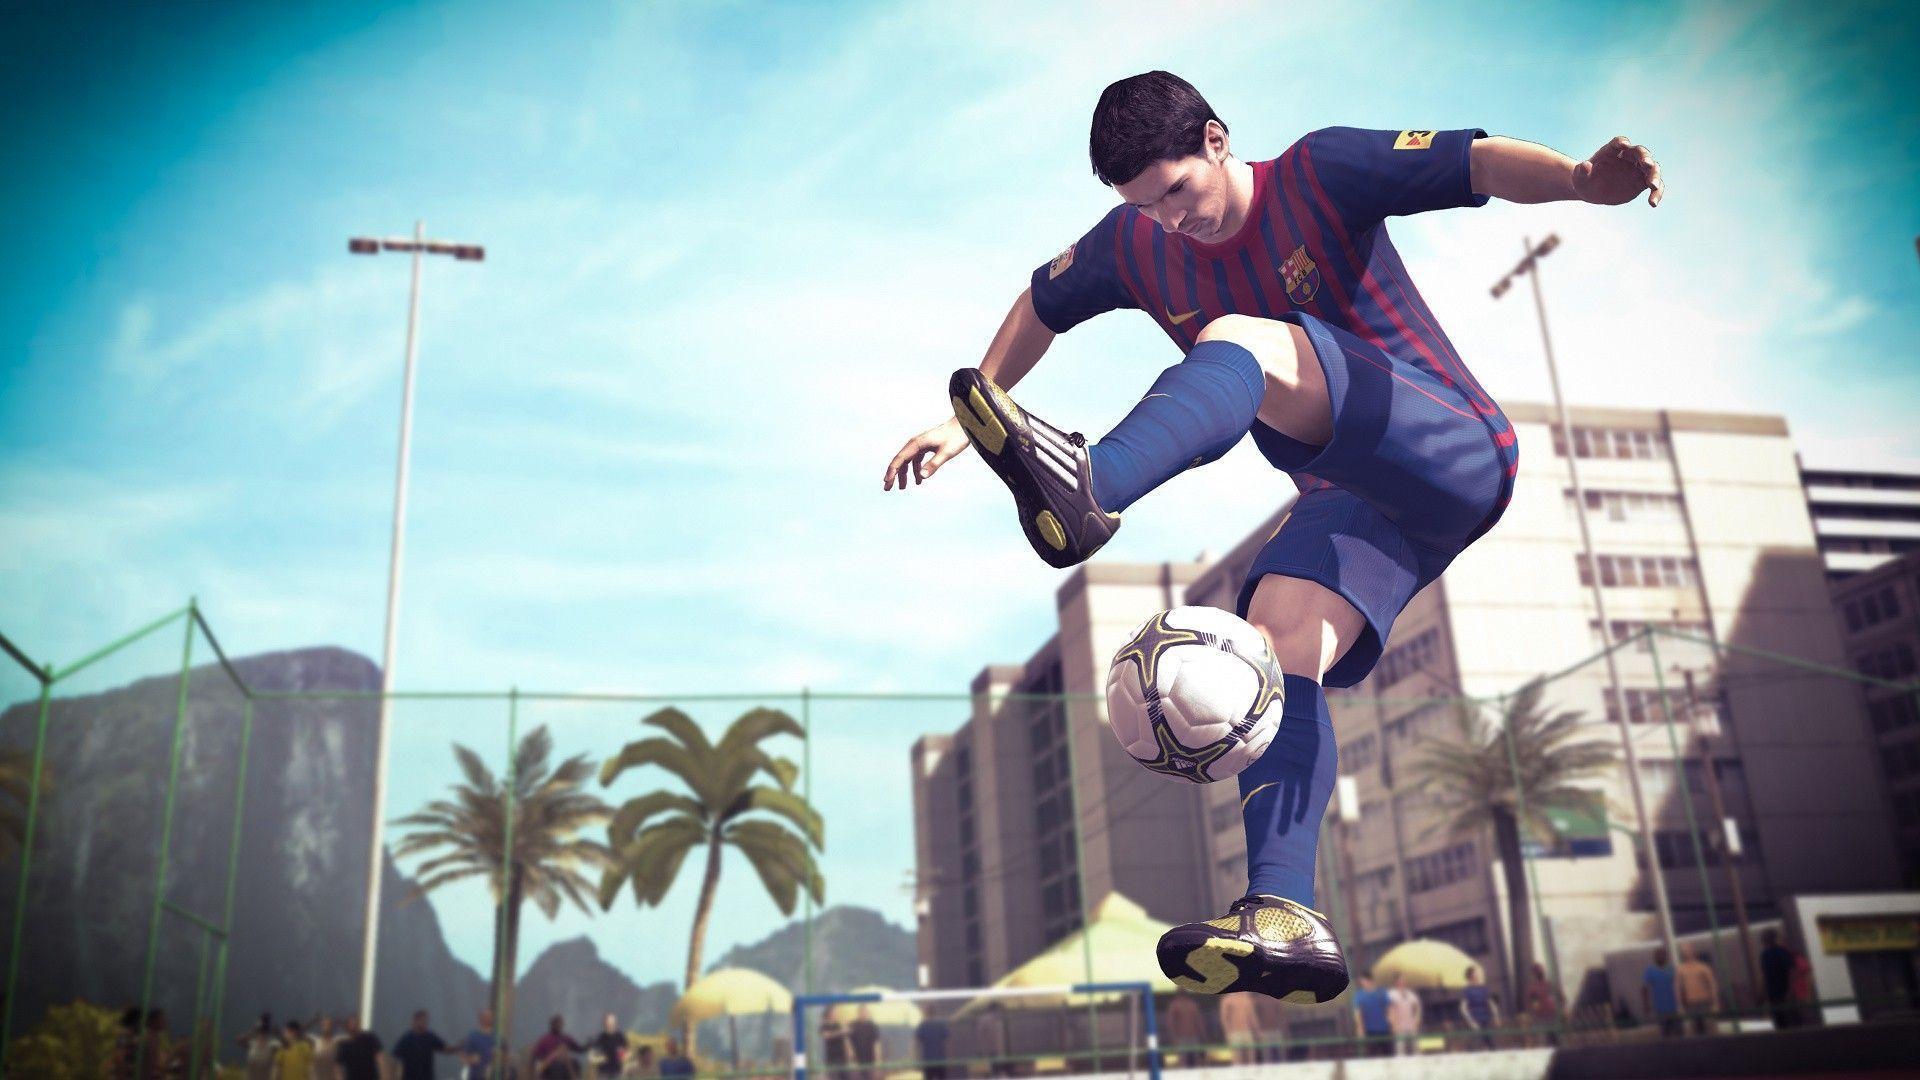 FIFA Street HD 1080p Wallpaper Download | HD Wallpapers Source